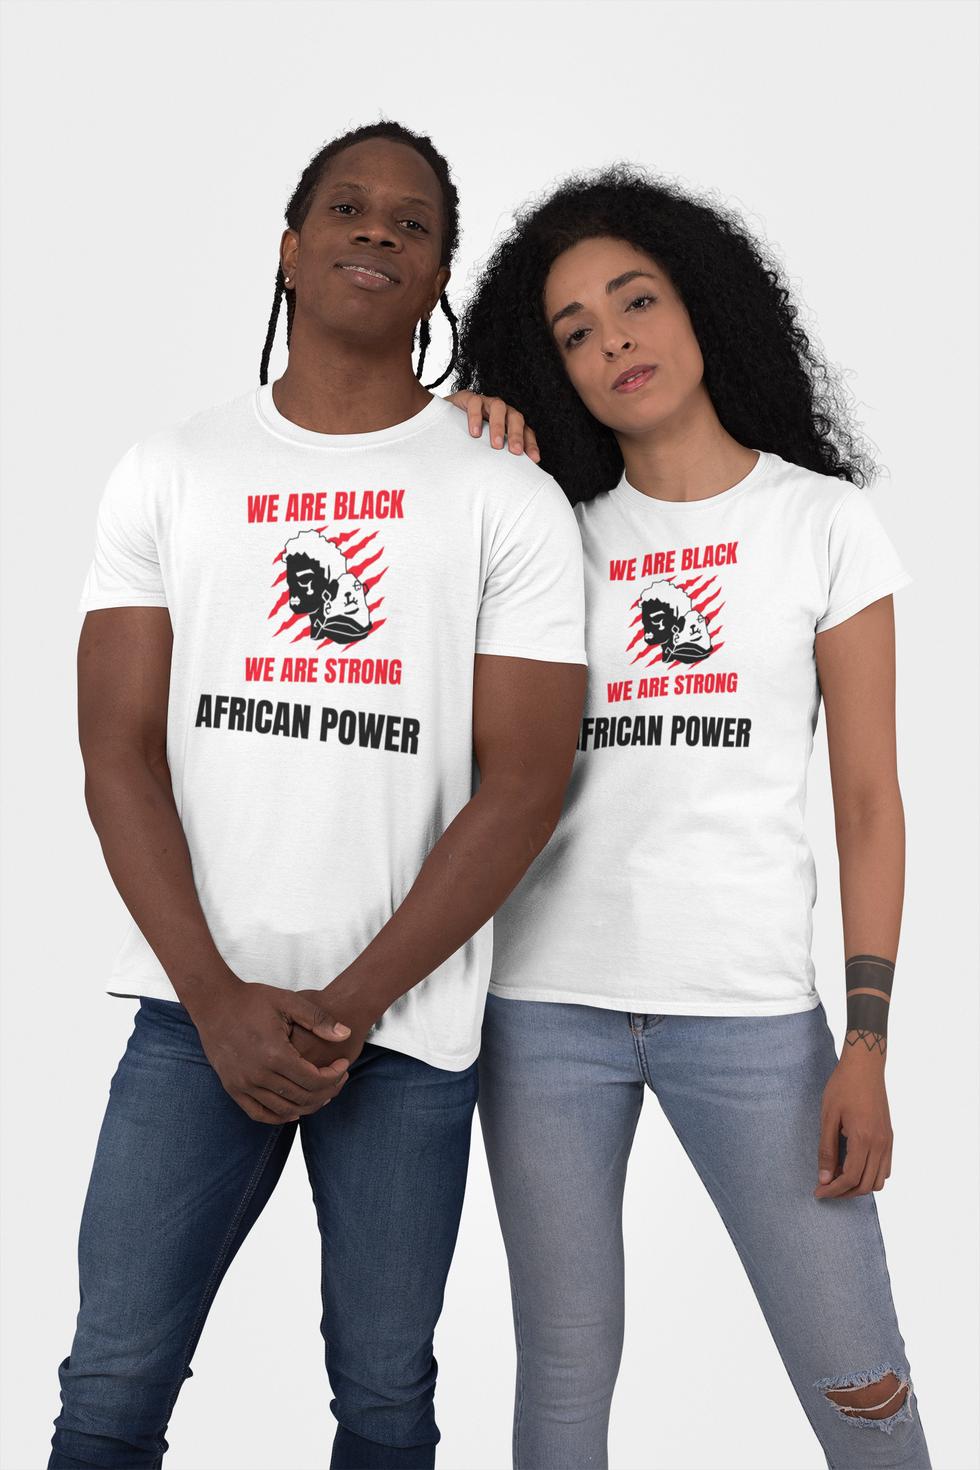 t-shirt-mockup-of-a-man-and-a-woman-posi